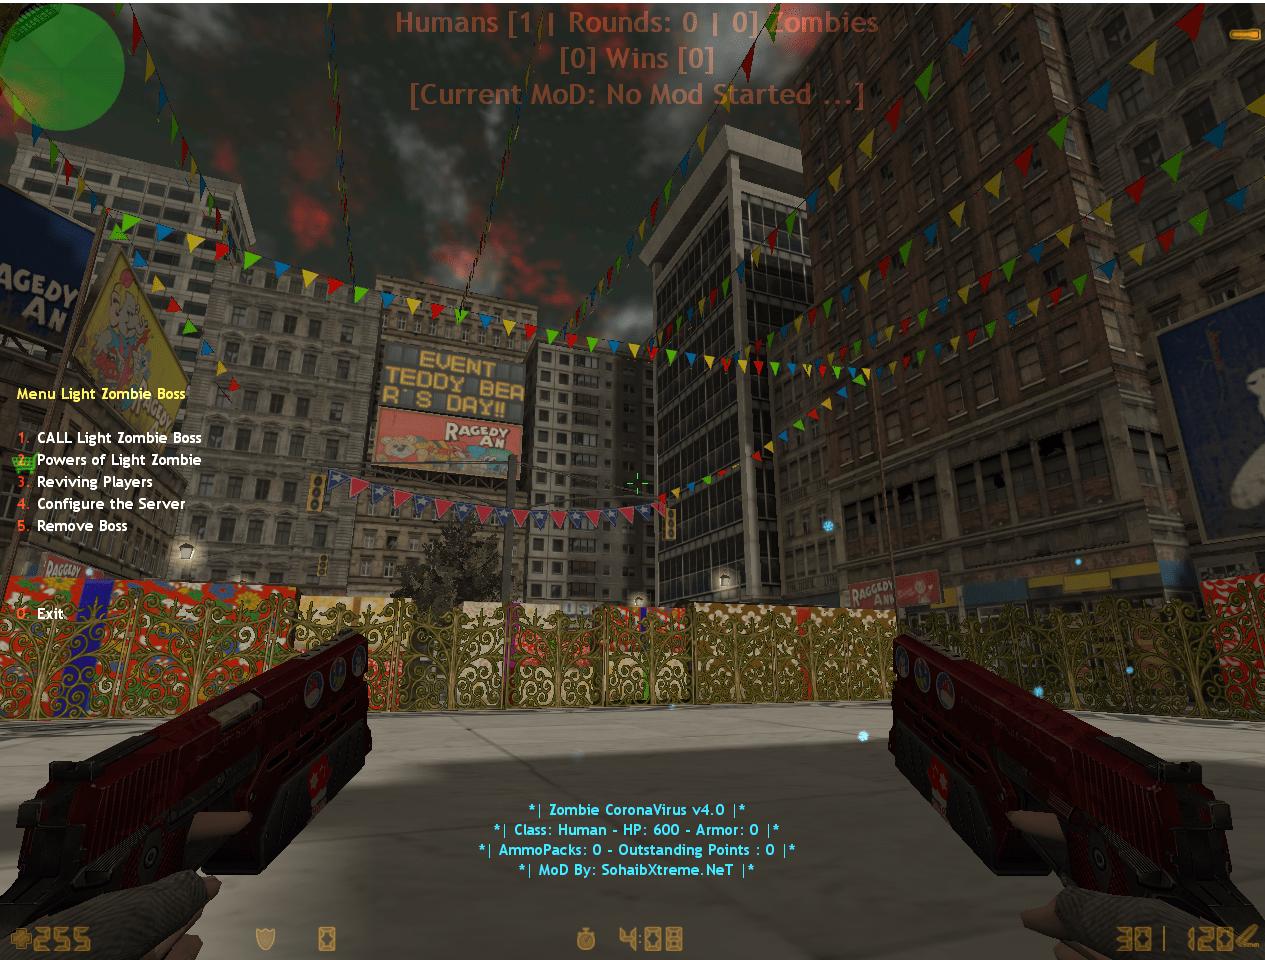 Counter-Strike 1.6 Zombie Big BoSS v2.0 Addon/Mod Download [ 2k21 ]